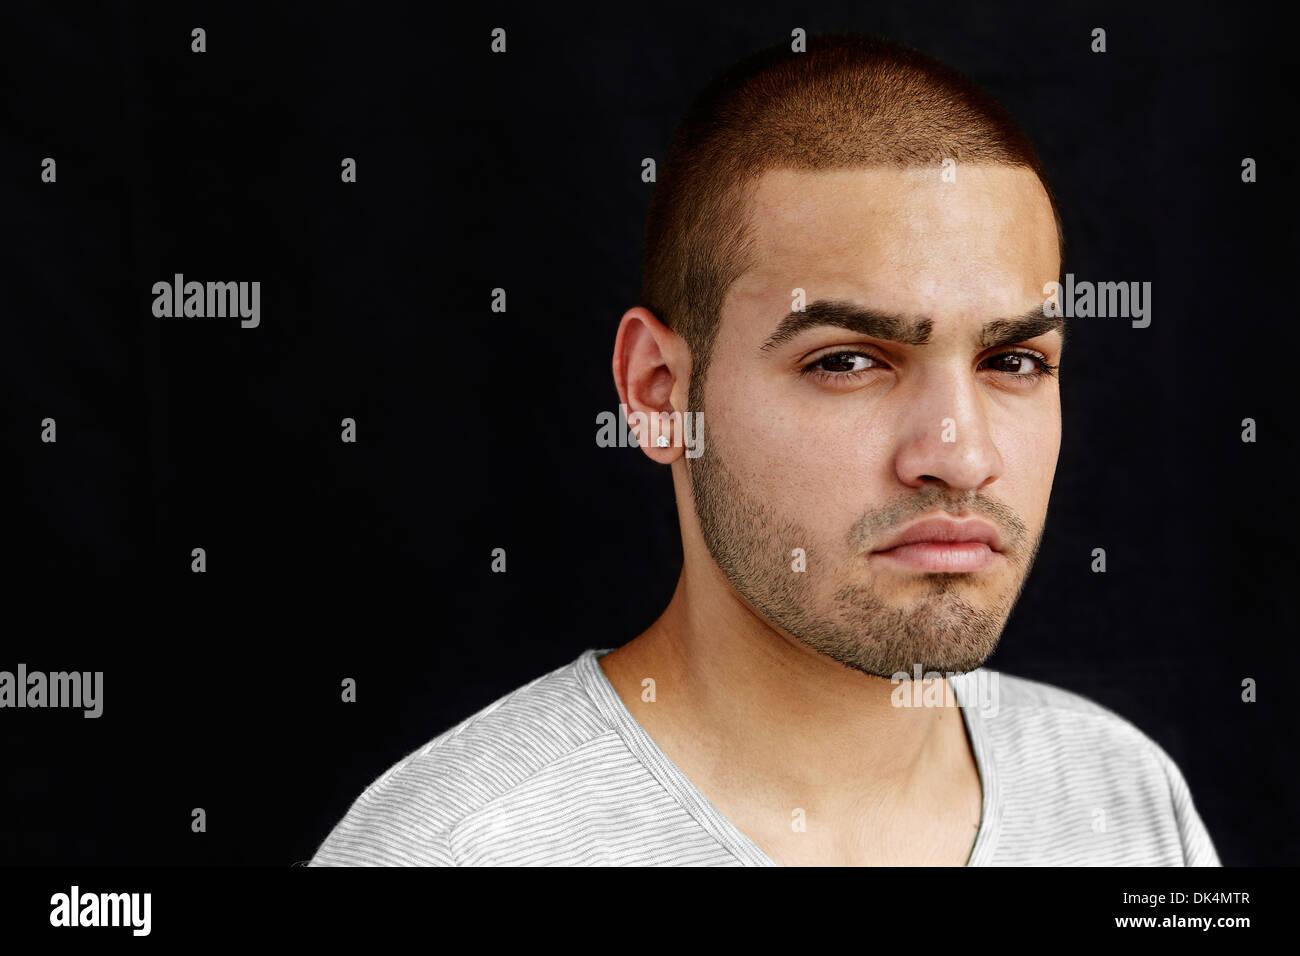 Portrait of Latino man looking at camera - Stock Image